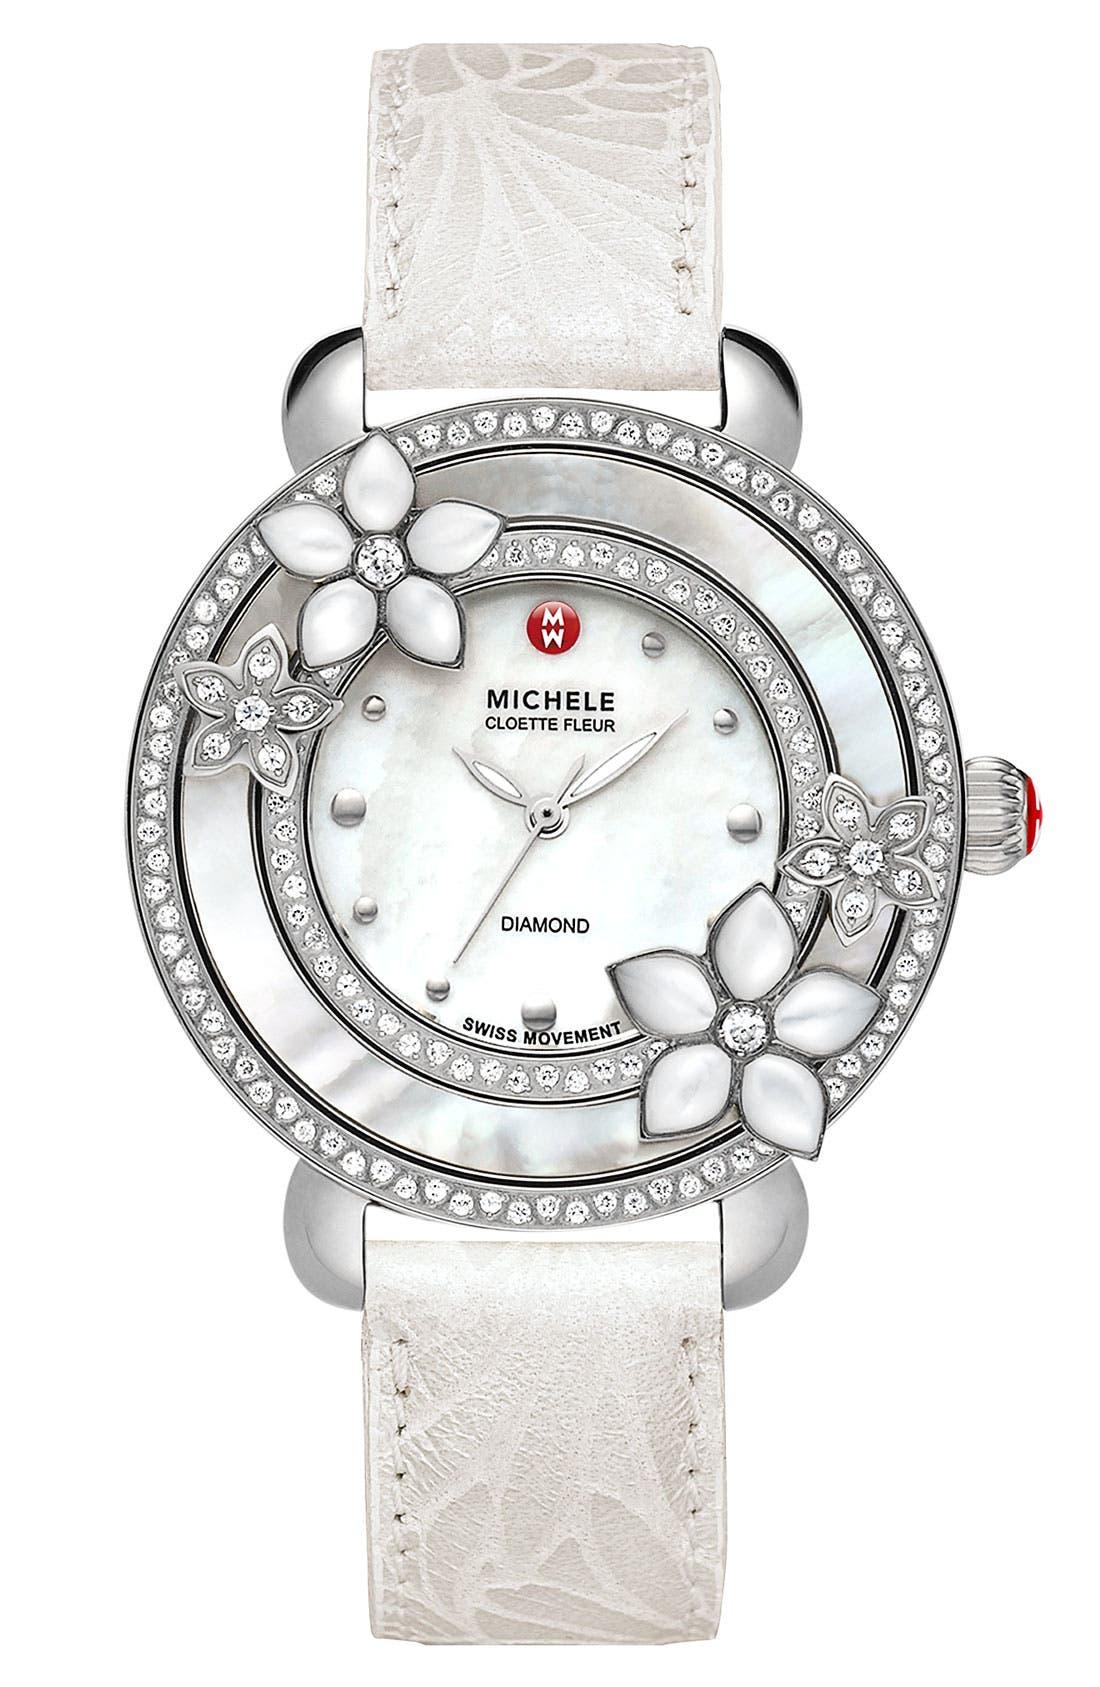 Alternate Image 3  - MICHELE 'Cloette Fleur' Diamond & Mother-of-Pearl Watch Case, 38mm